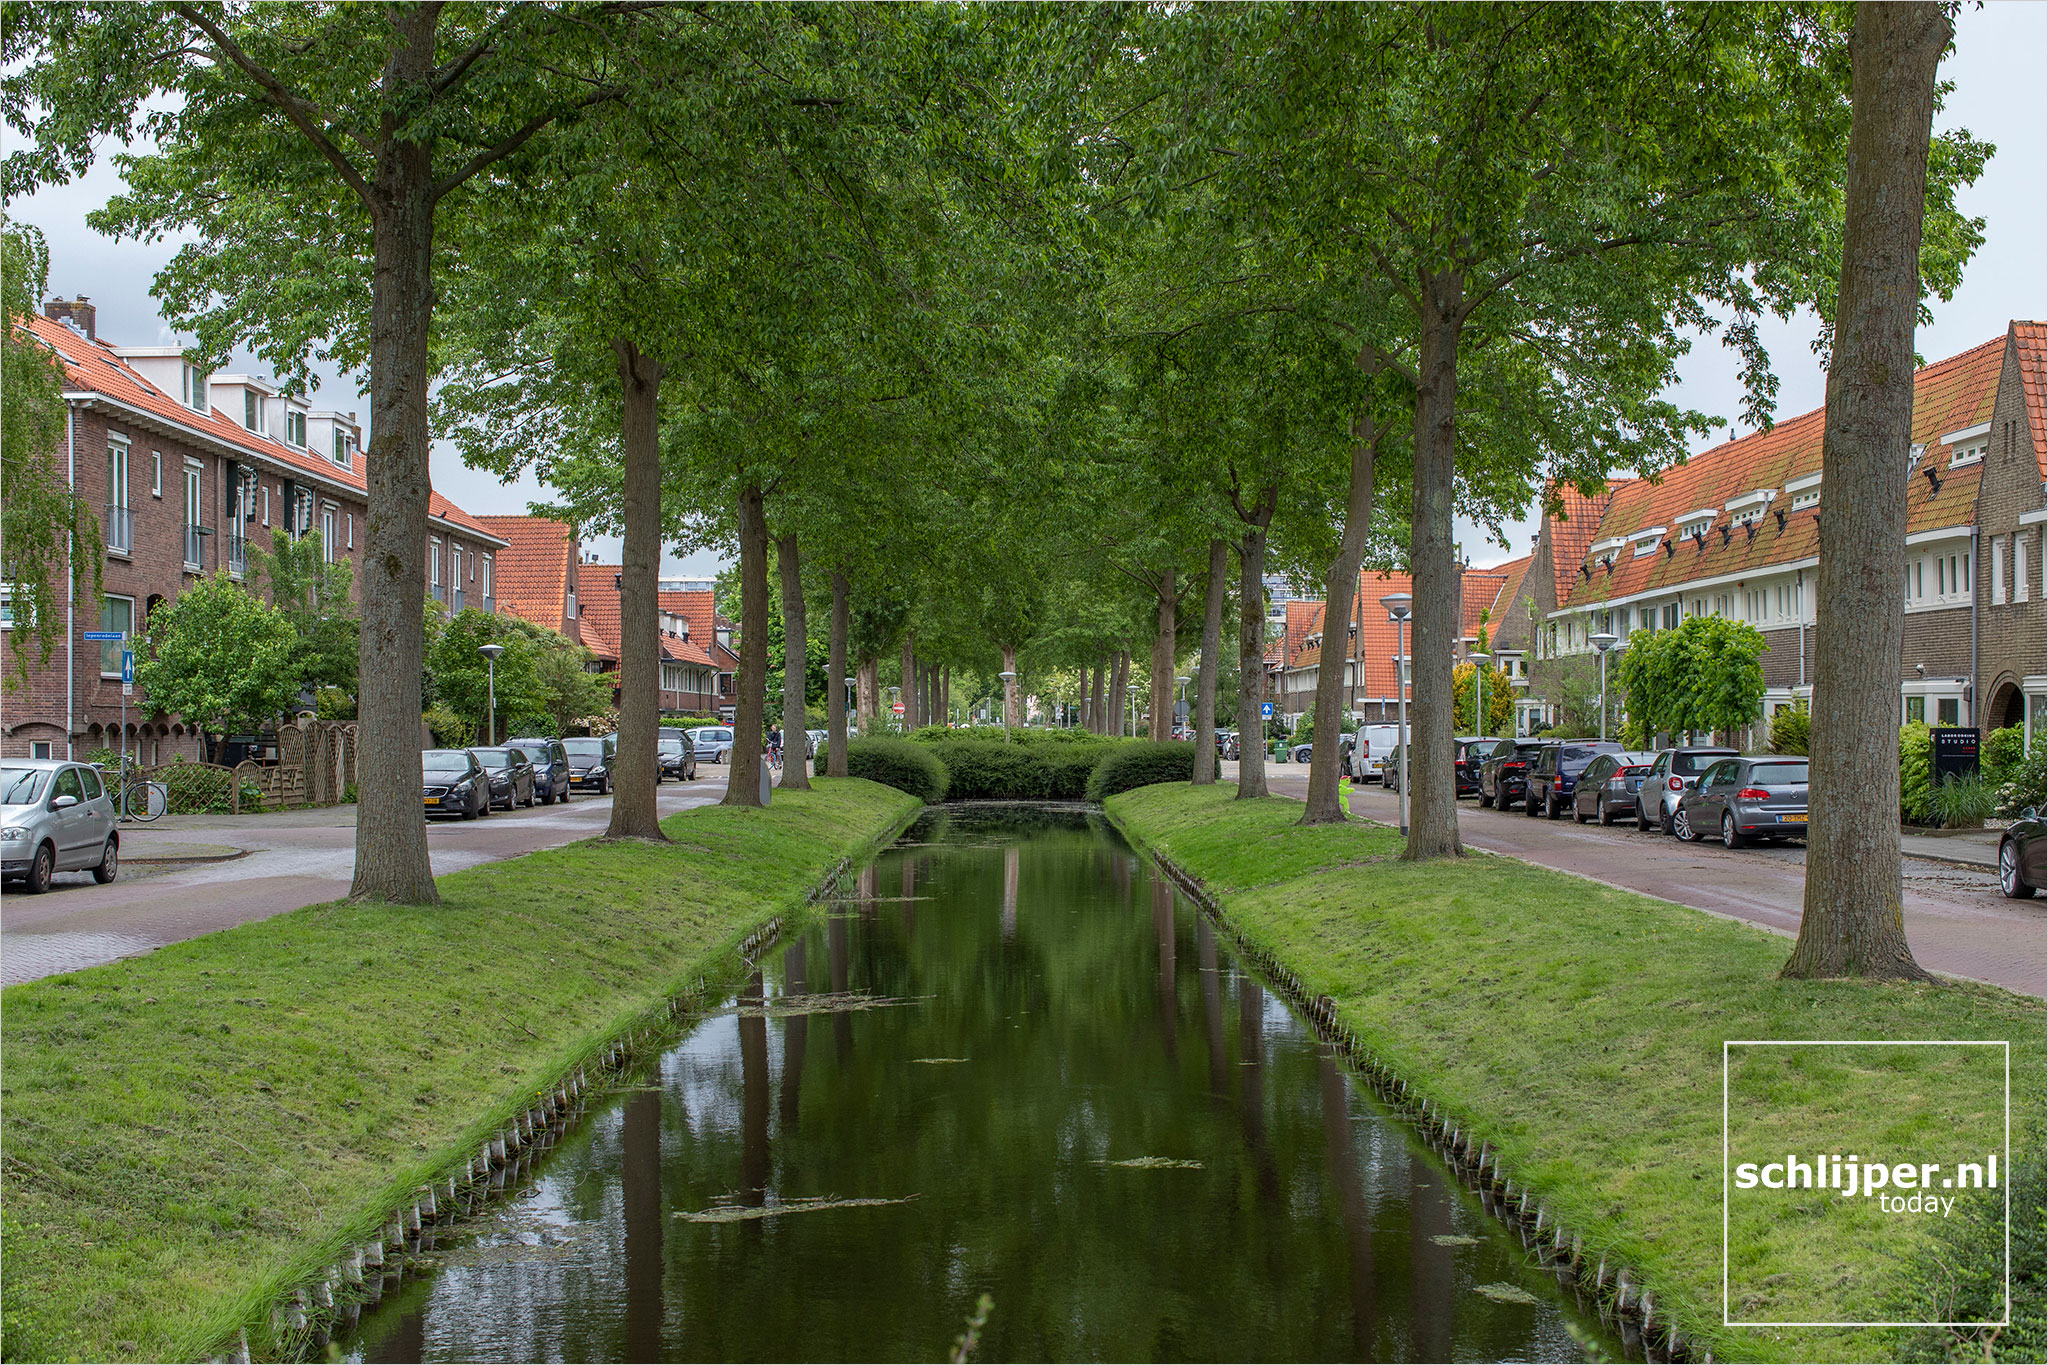 Nederland, Amstelveen, 12 mei 2020